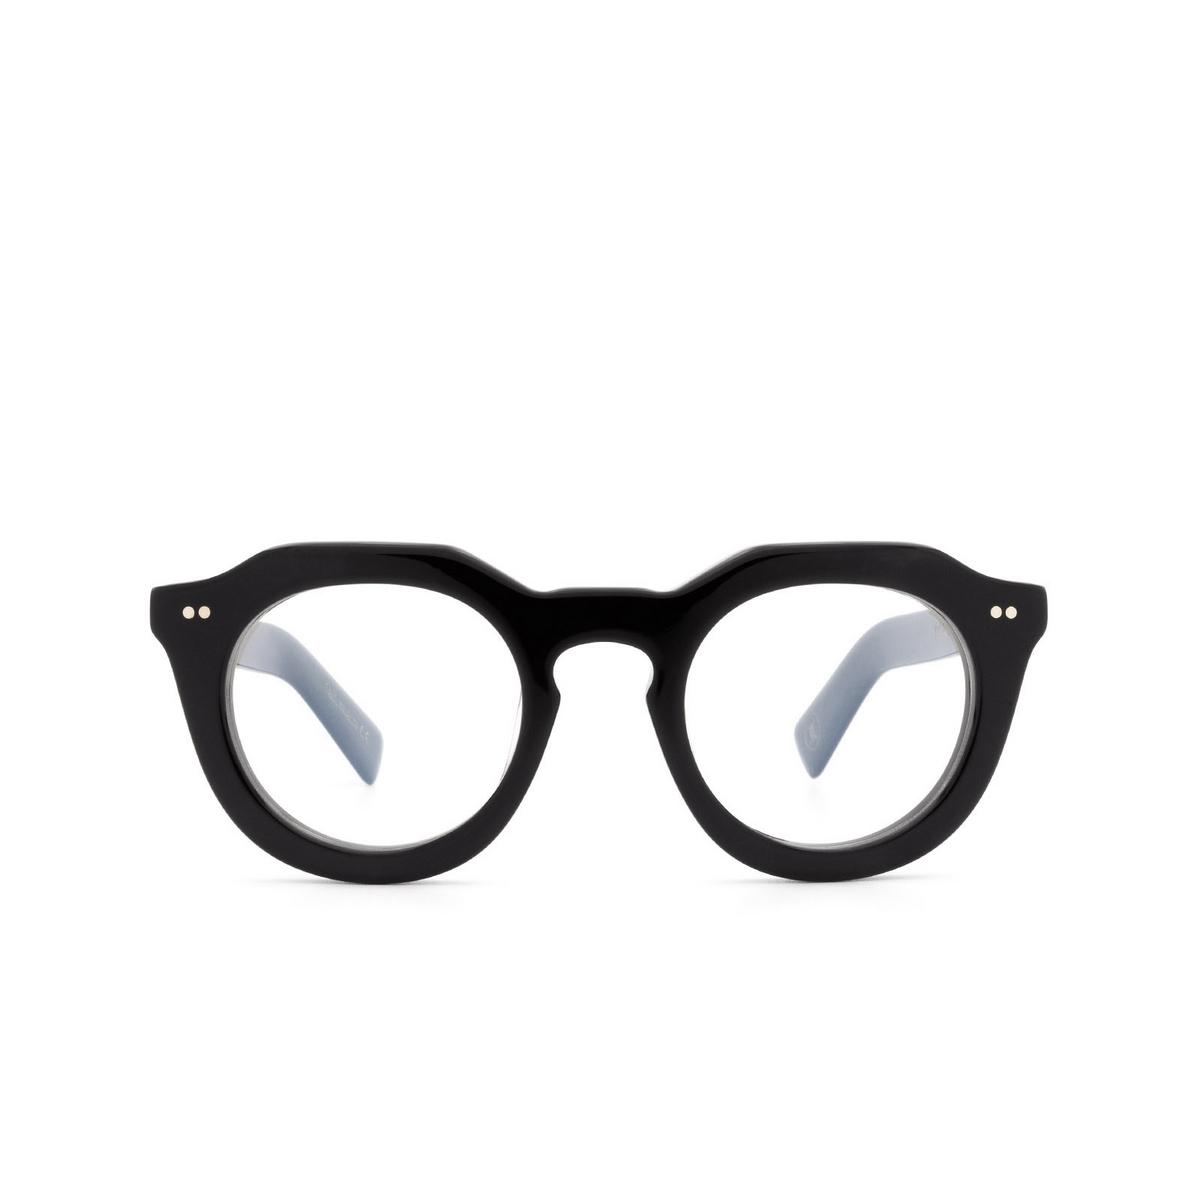 Lesca® Irregular Eyeglasses: Toro Optic color Black 5 - front view.